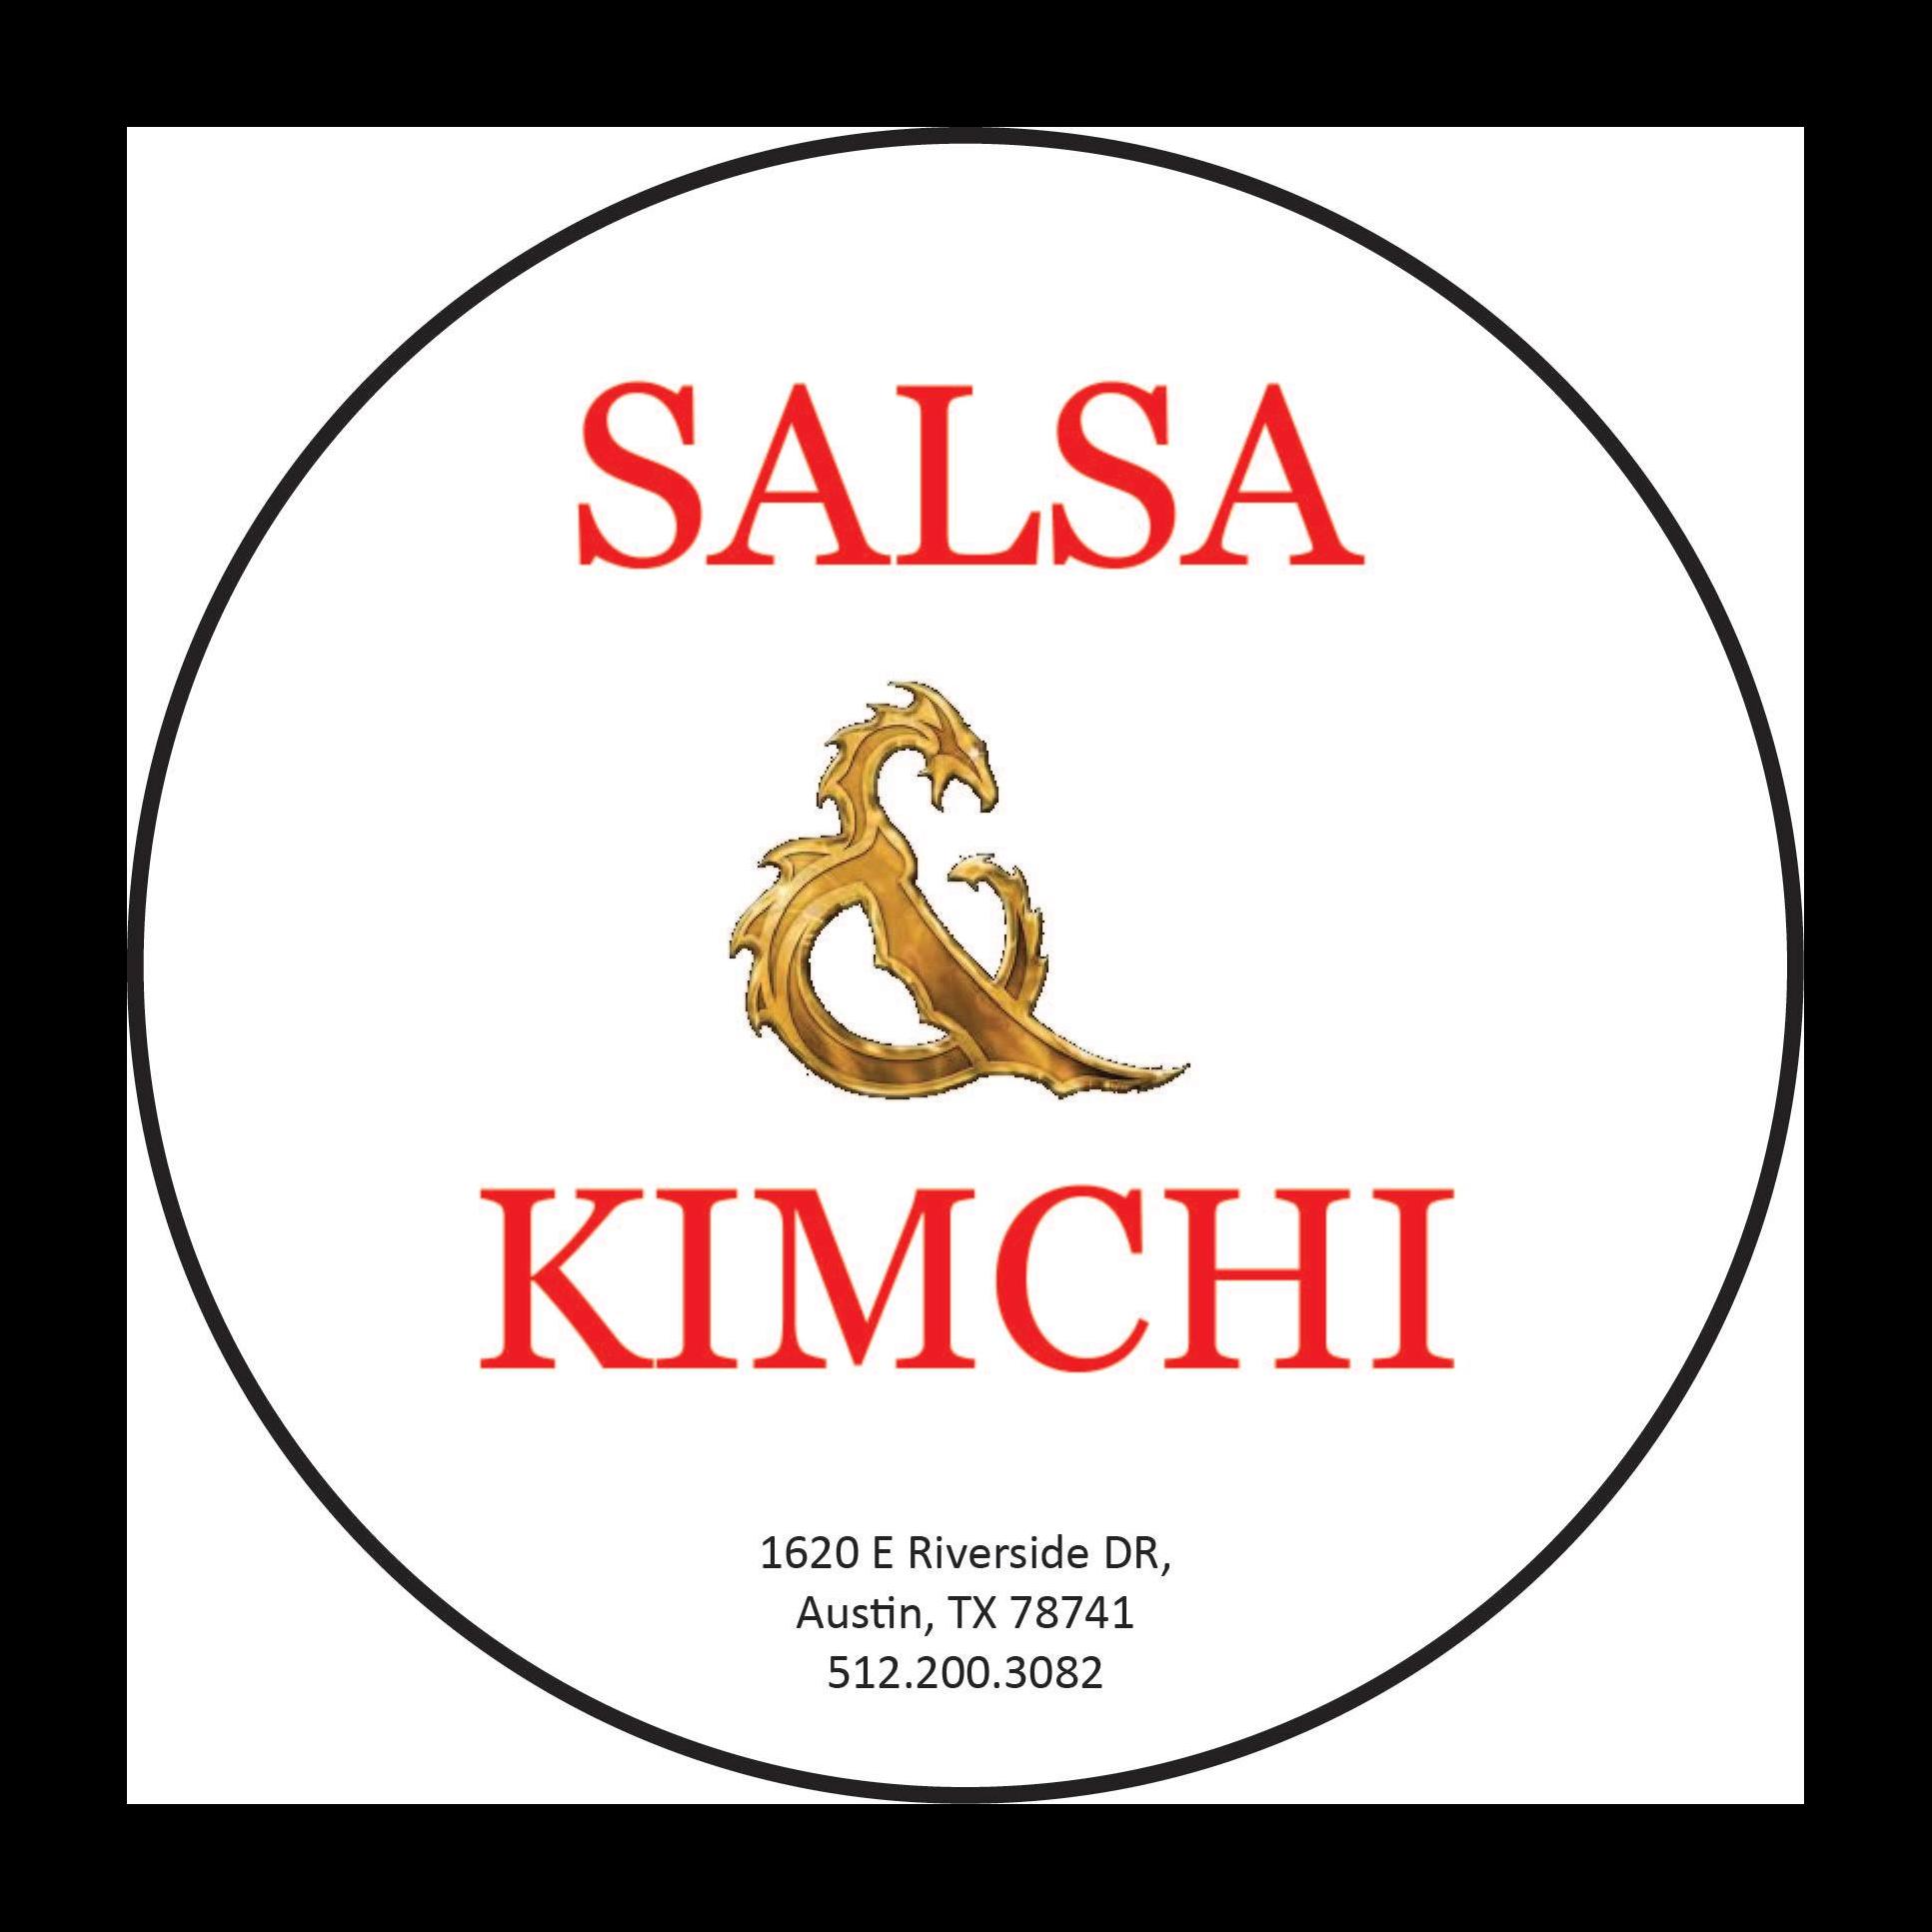 Salsa and Kimchi logo